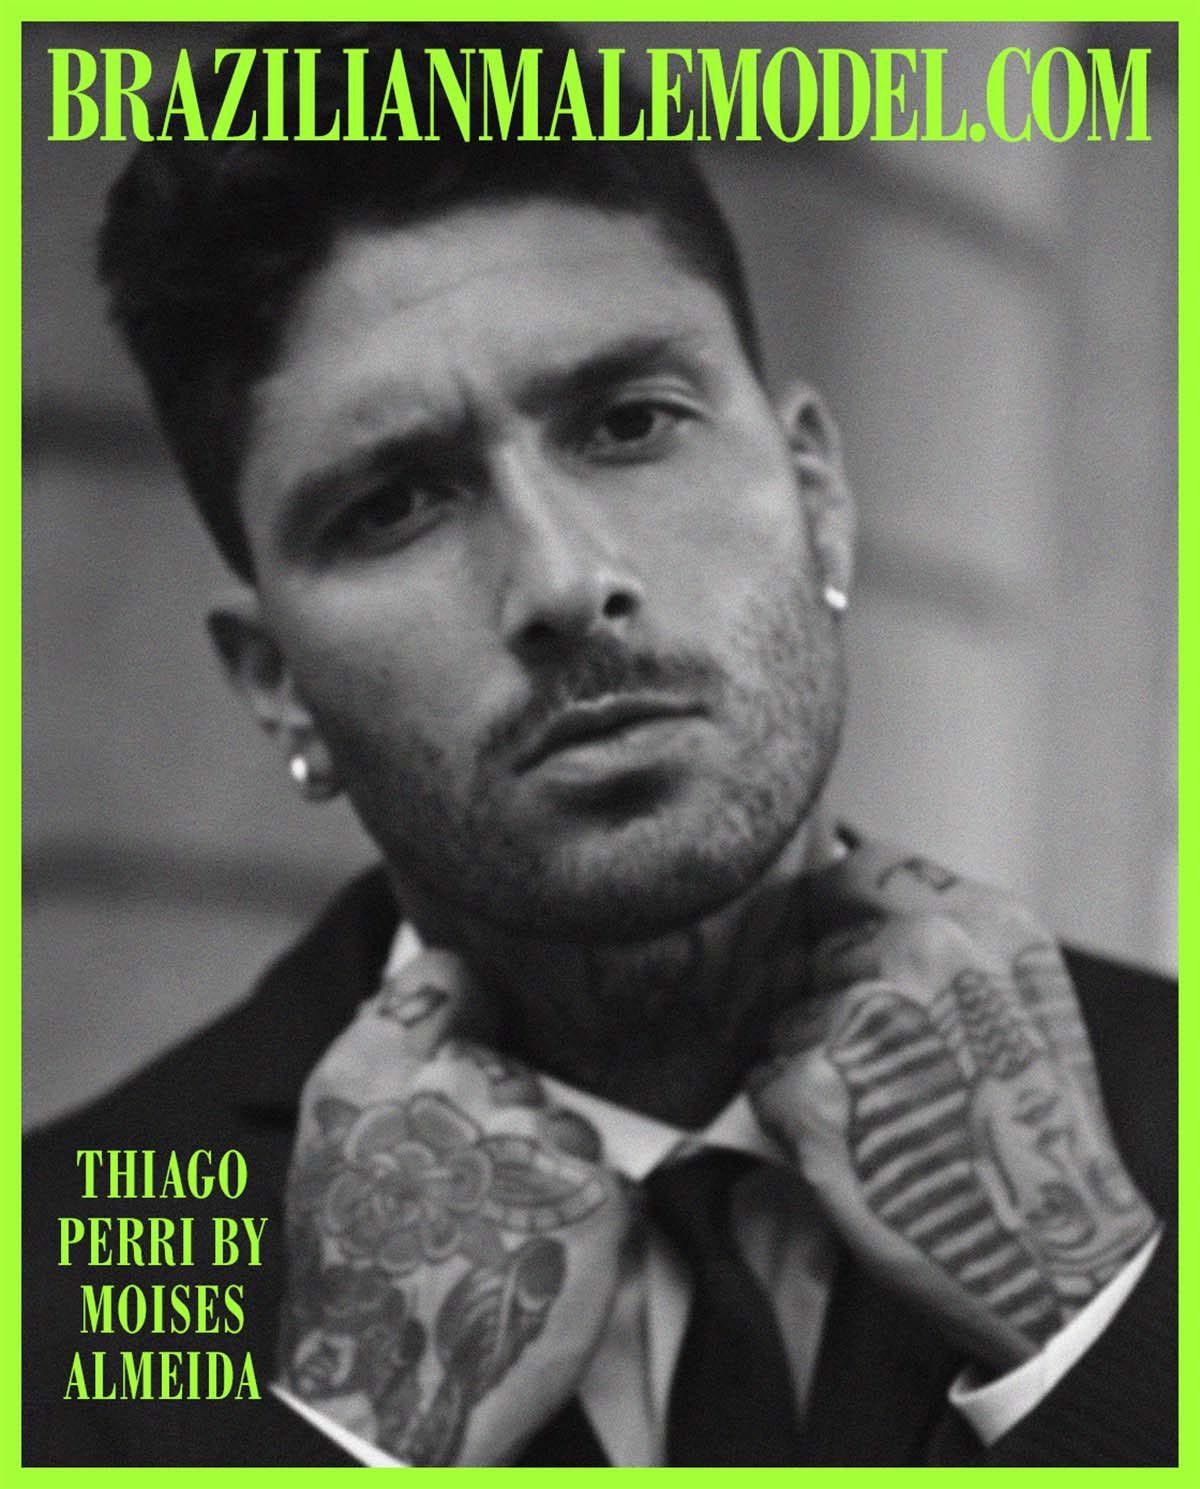 Thiago Perri by Moises Almeida